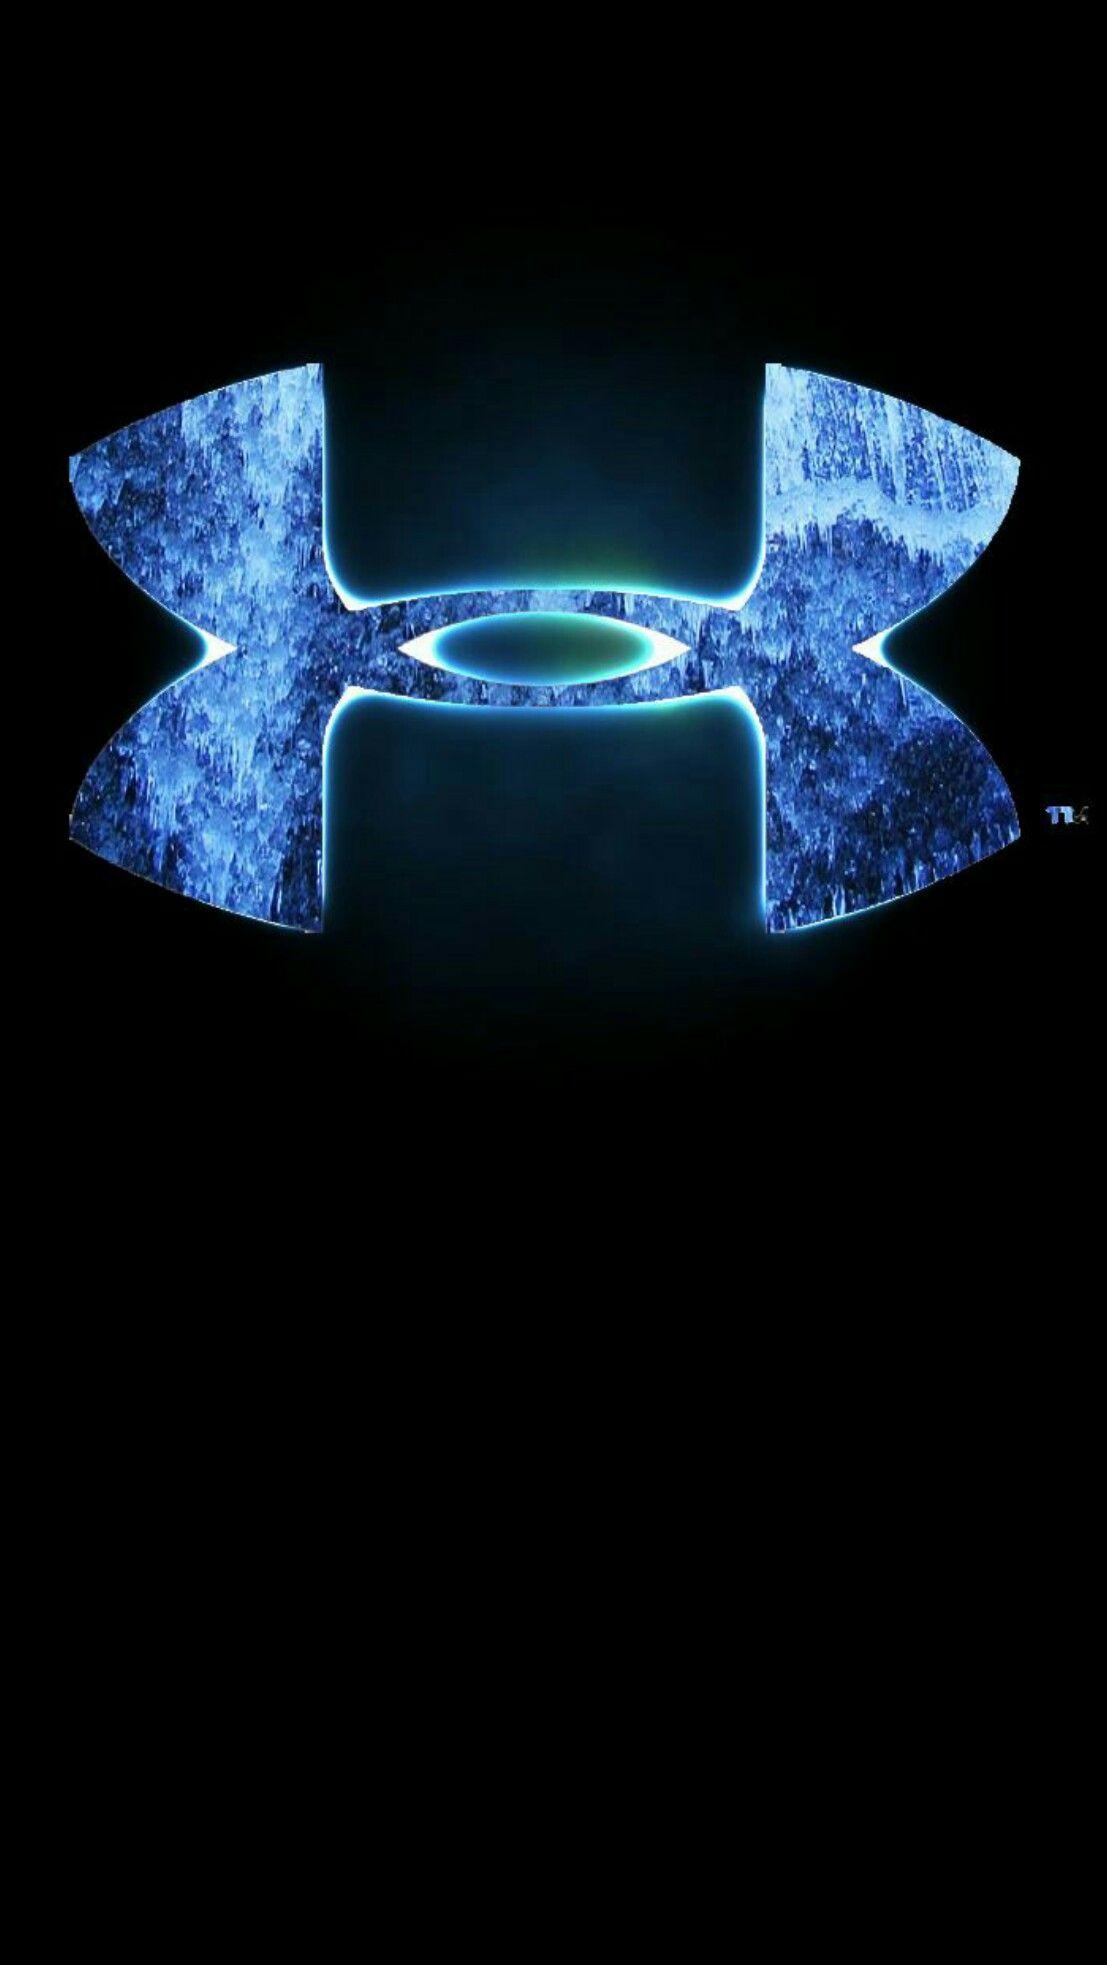 Underarmour Black Wallpaper Iphone Android アンダーアーマー